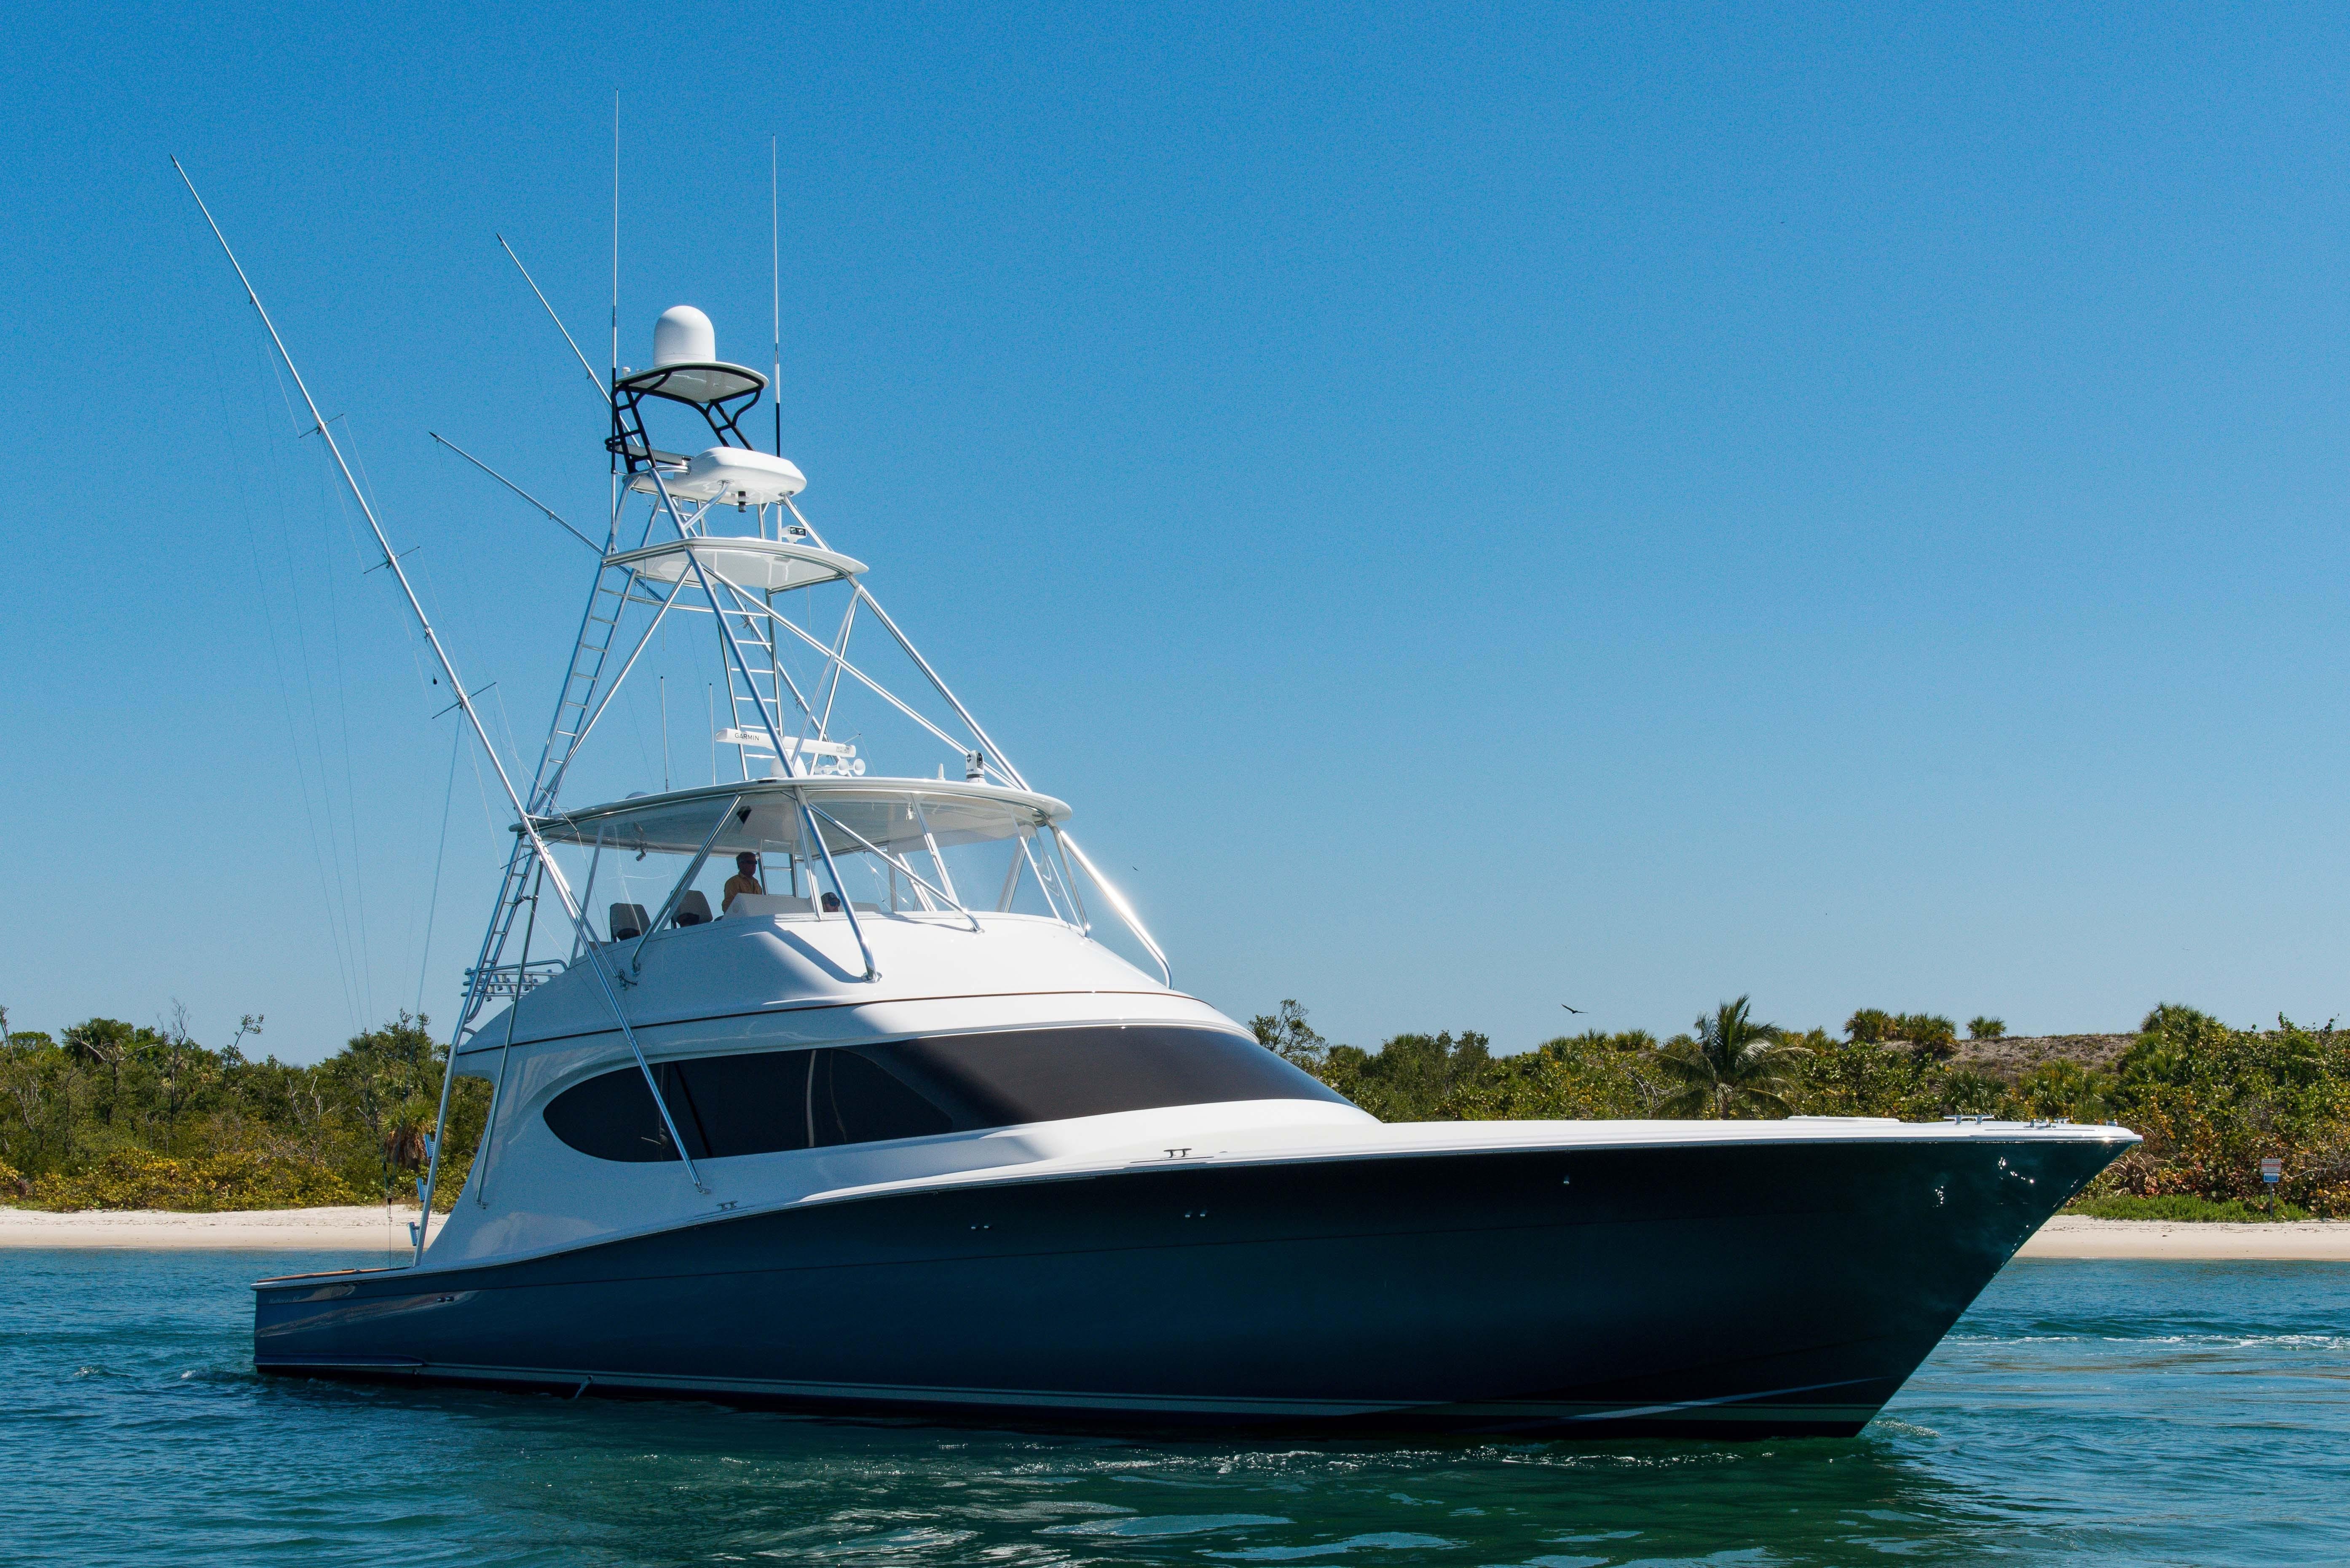 2017 hatteras 70 gt power boat for sale www yachtworld com rh yachtworld com